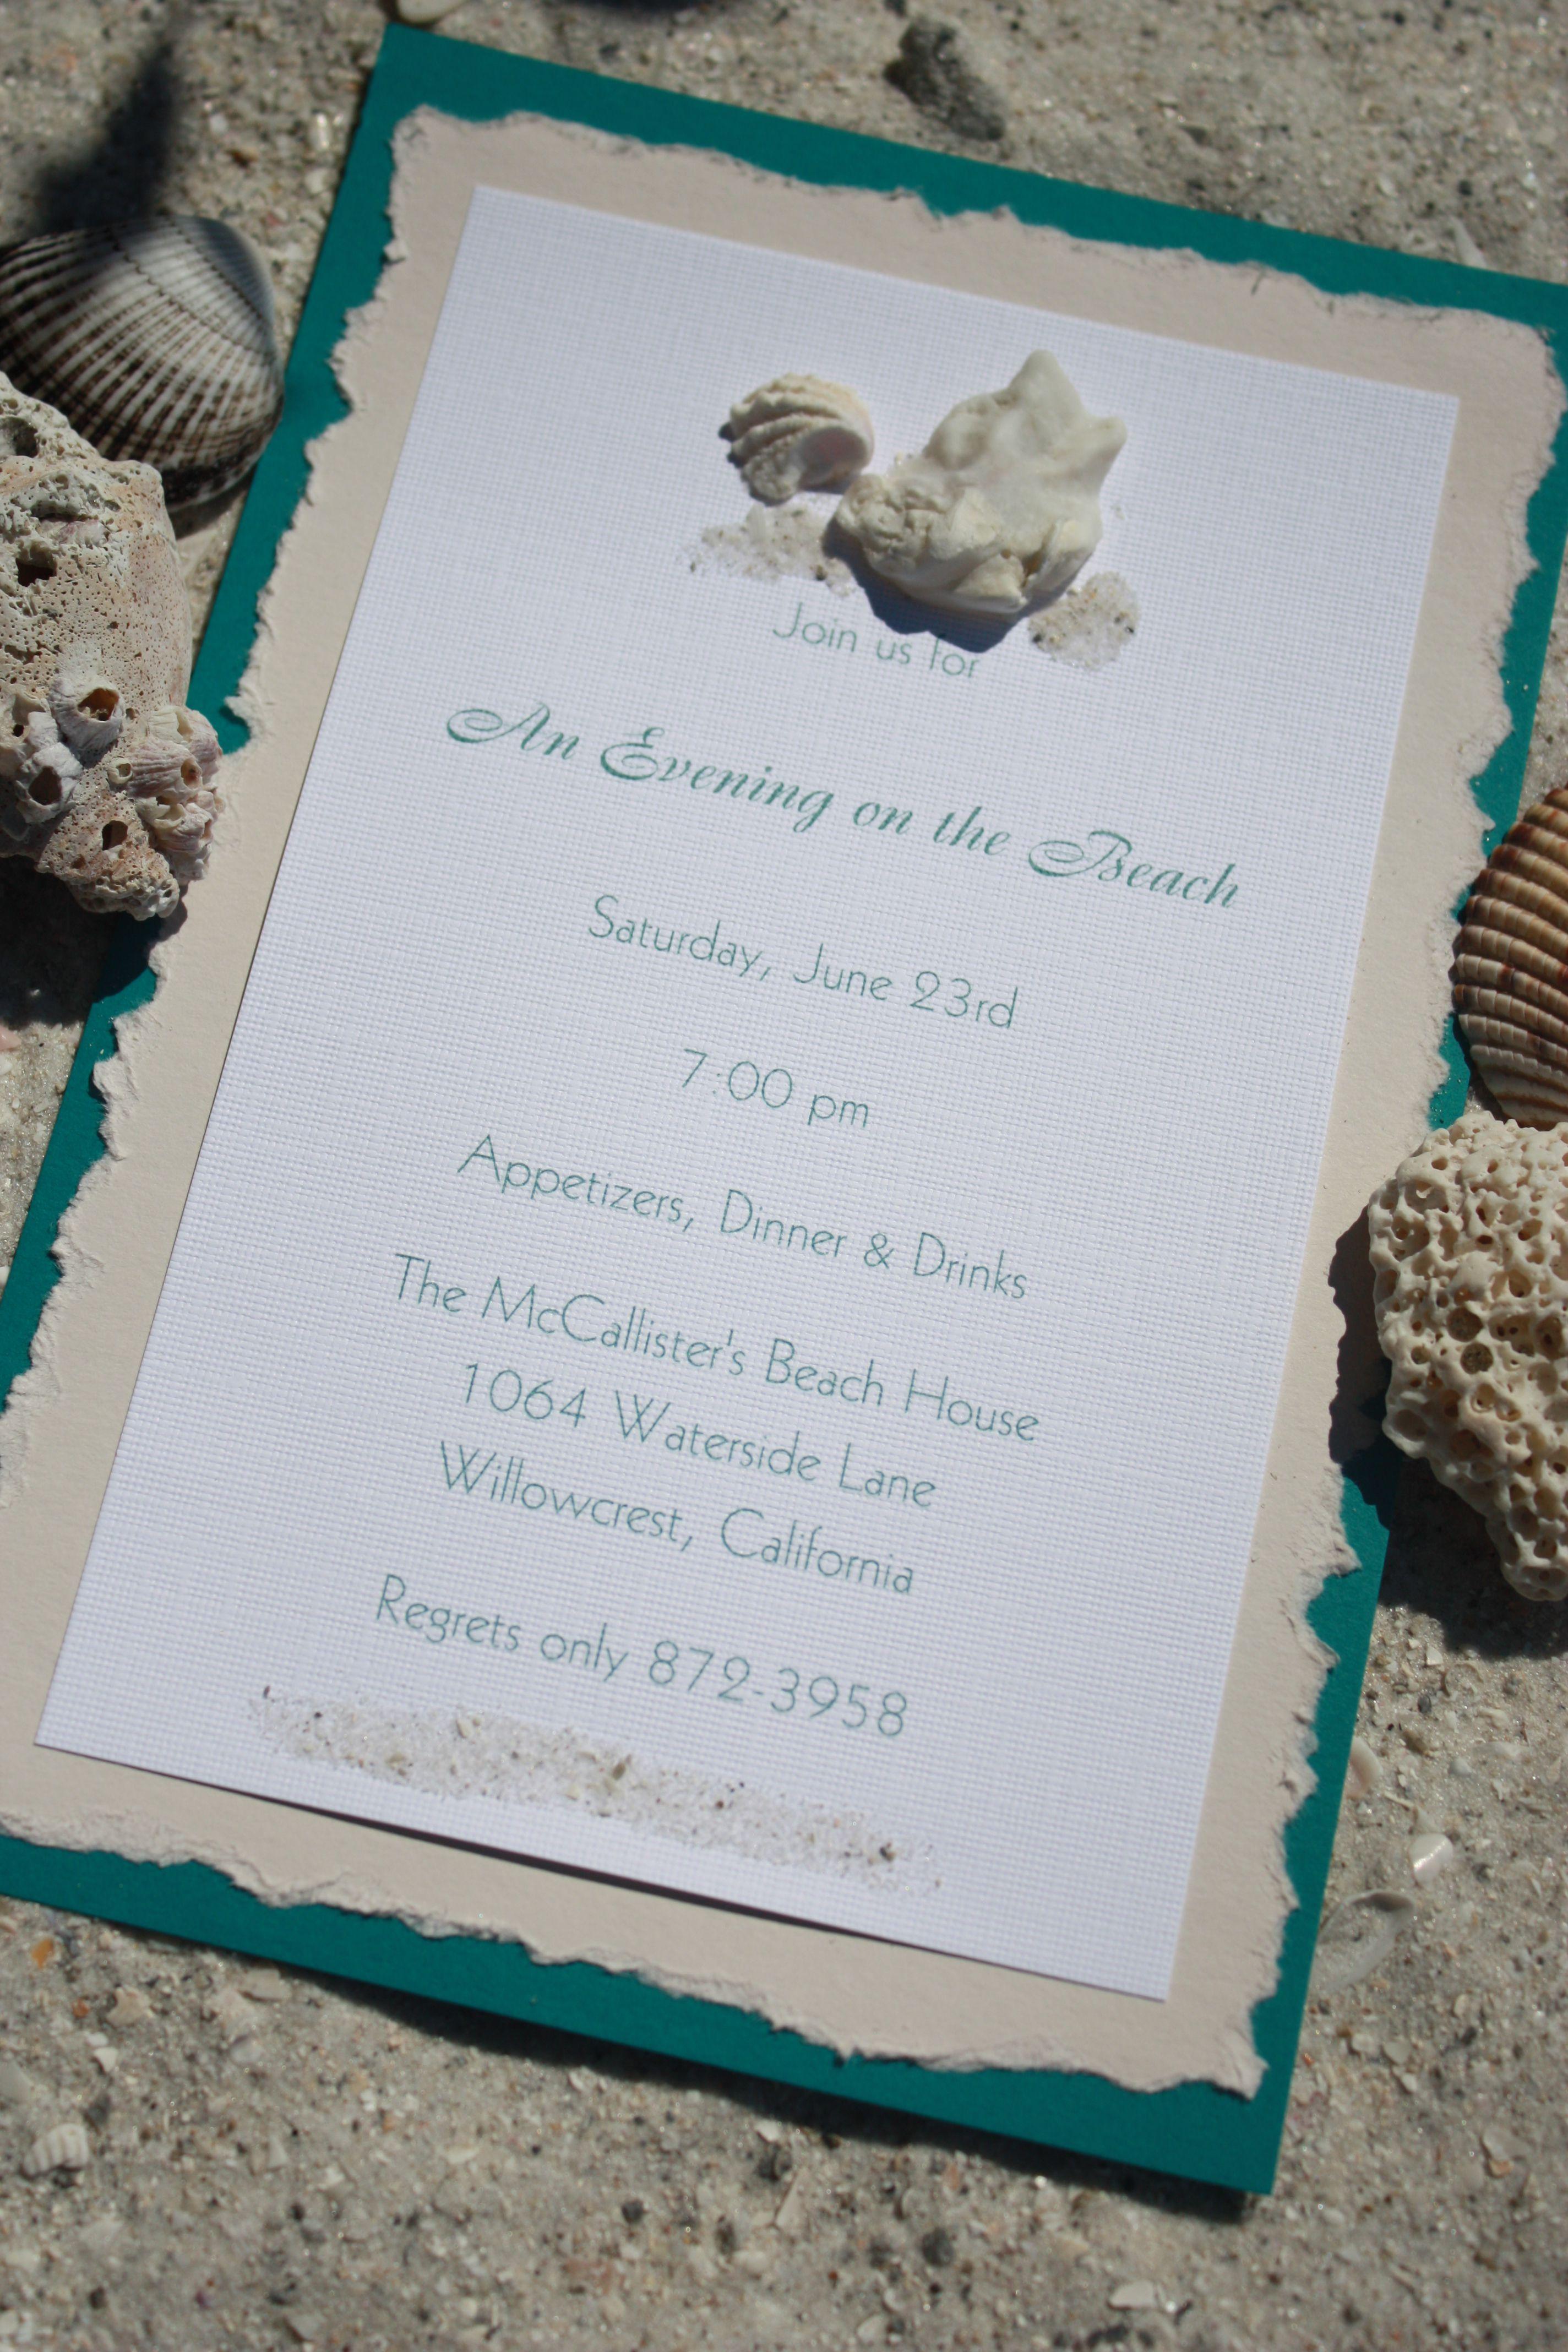 Beach themed wedding invitations do it yourself wedding beach themed wedding invitations do it yourself monicamarmolfo Image collections